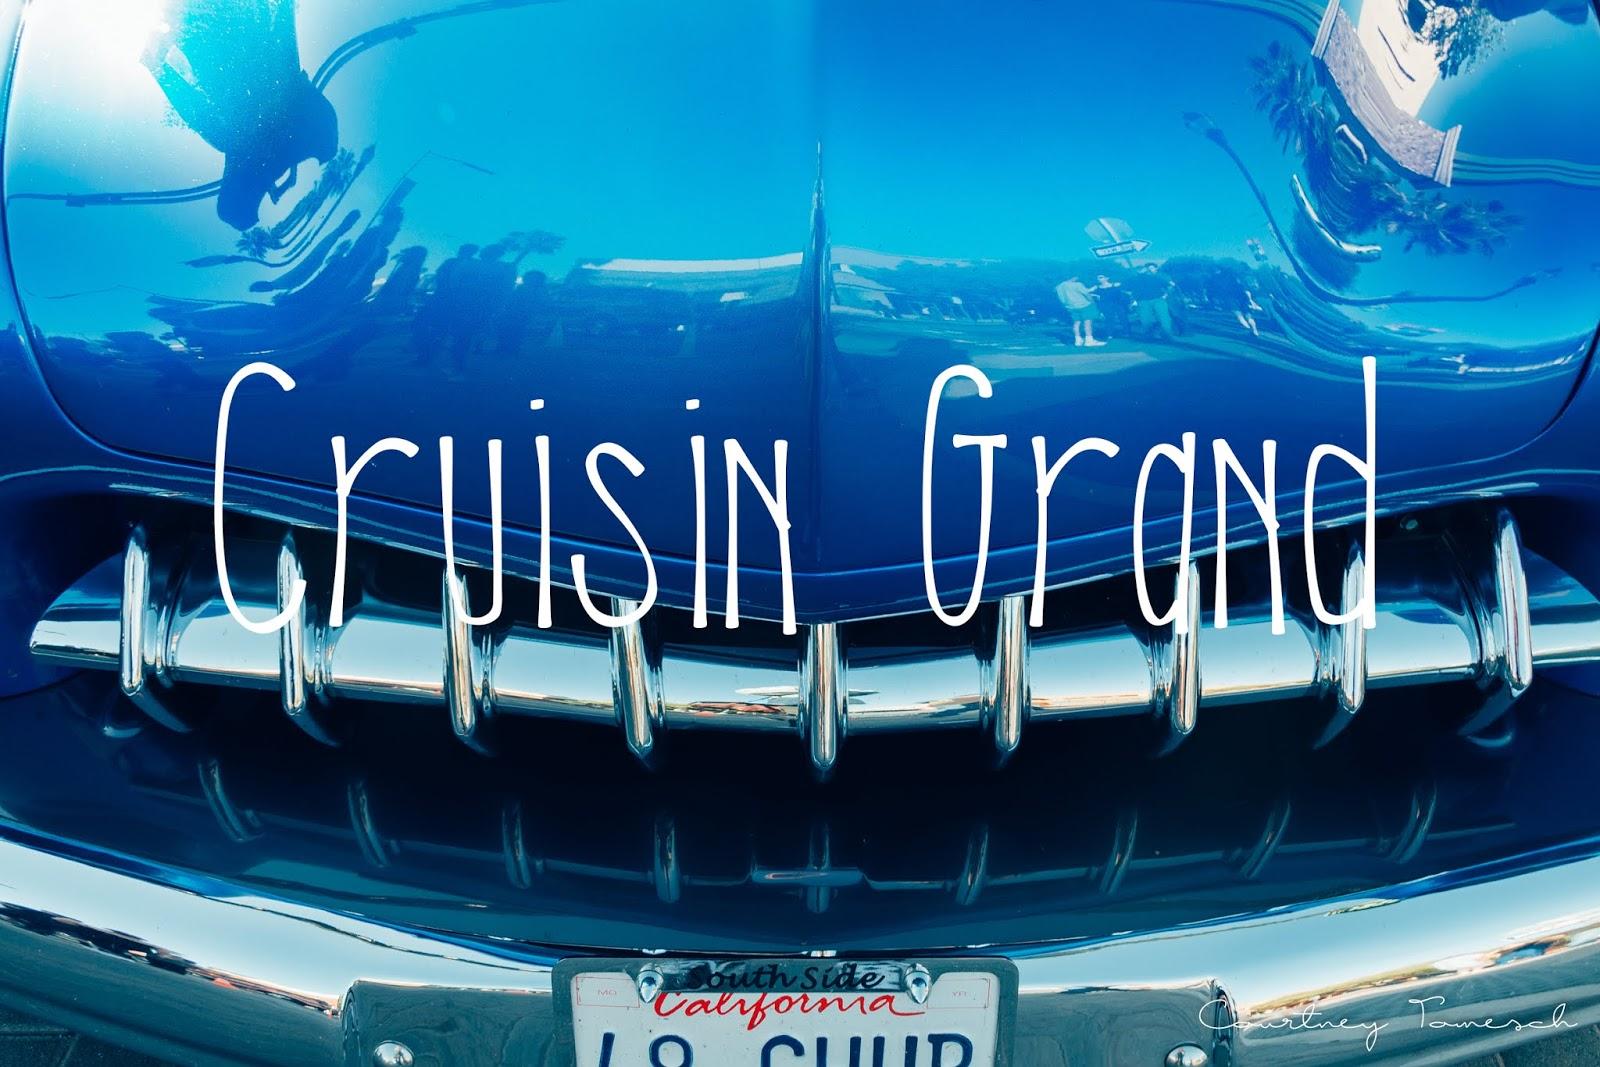 Courtney Tomesch Cruisin Grand Escondido CA